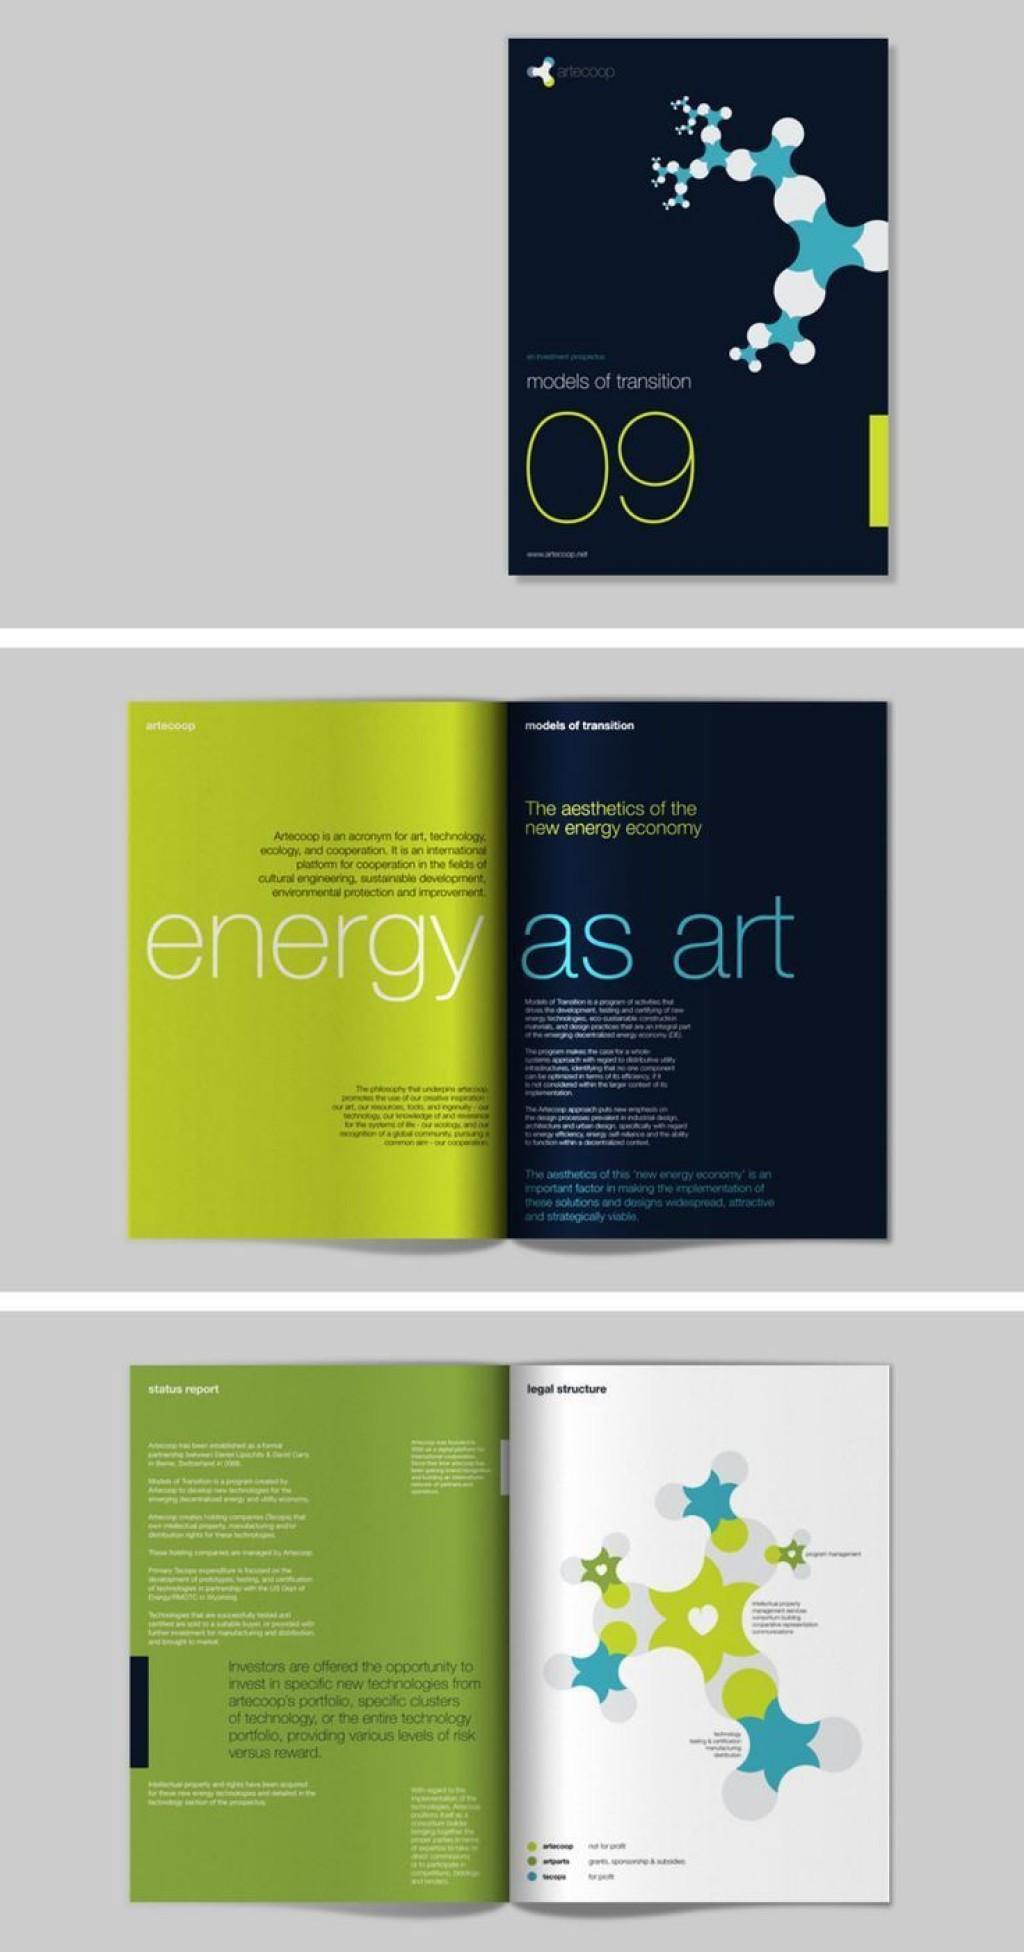 008 Remarkable Brochure Template For Word 2010 Design  Download Microsoft Free Blank Tri FoldLarge